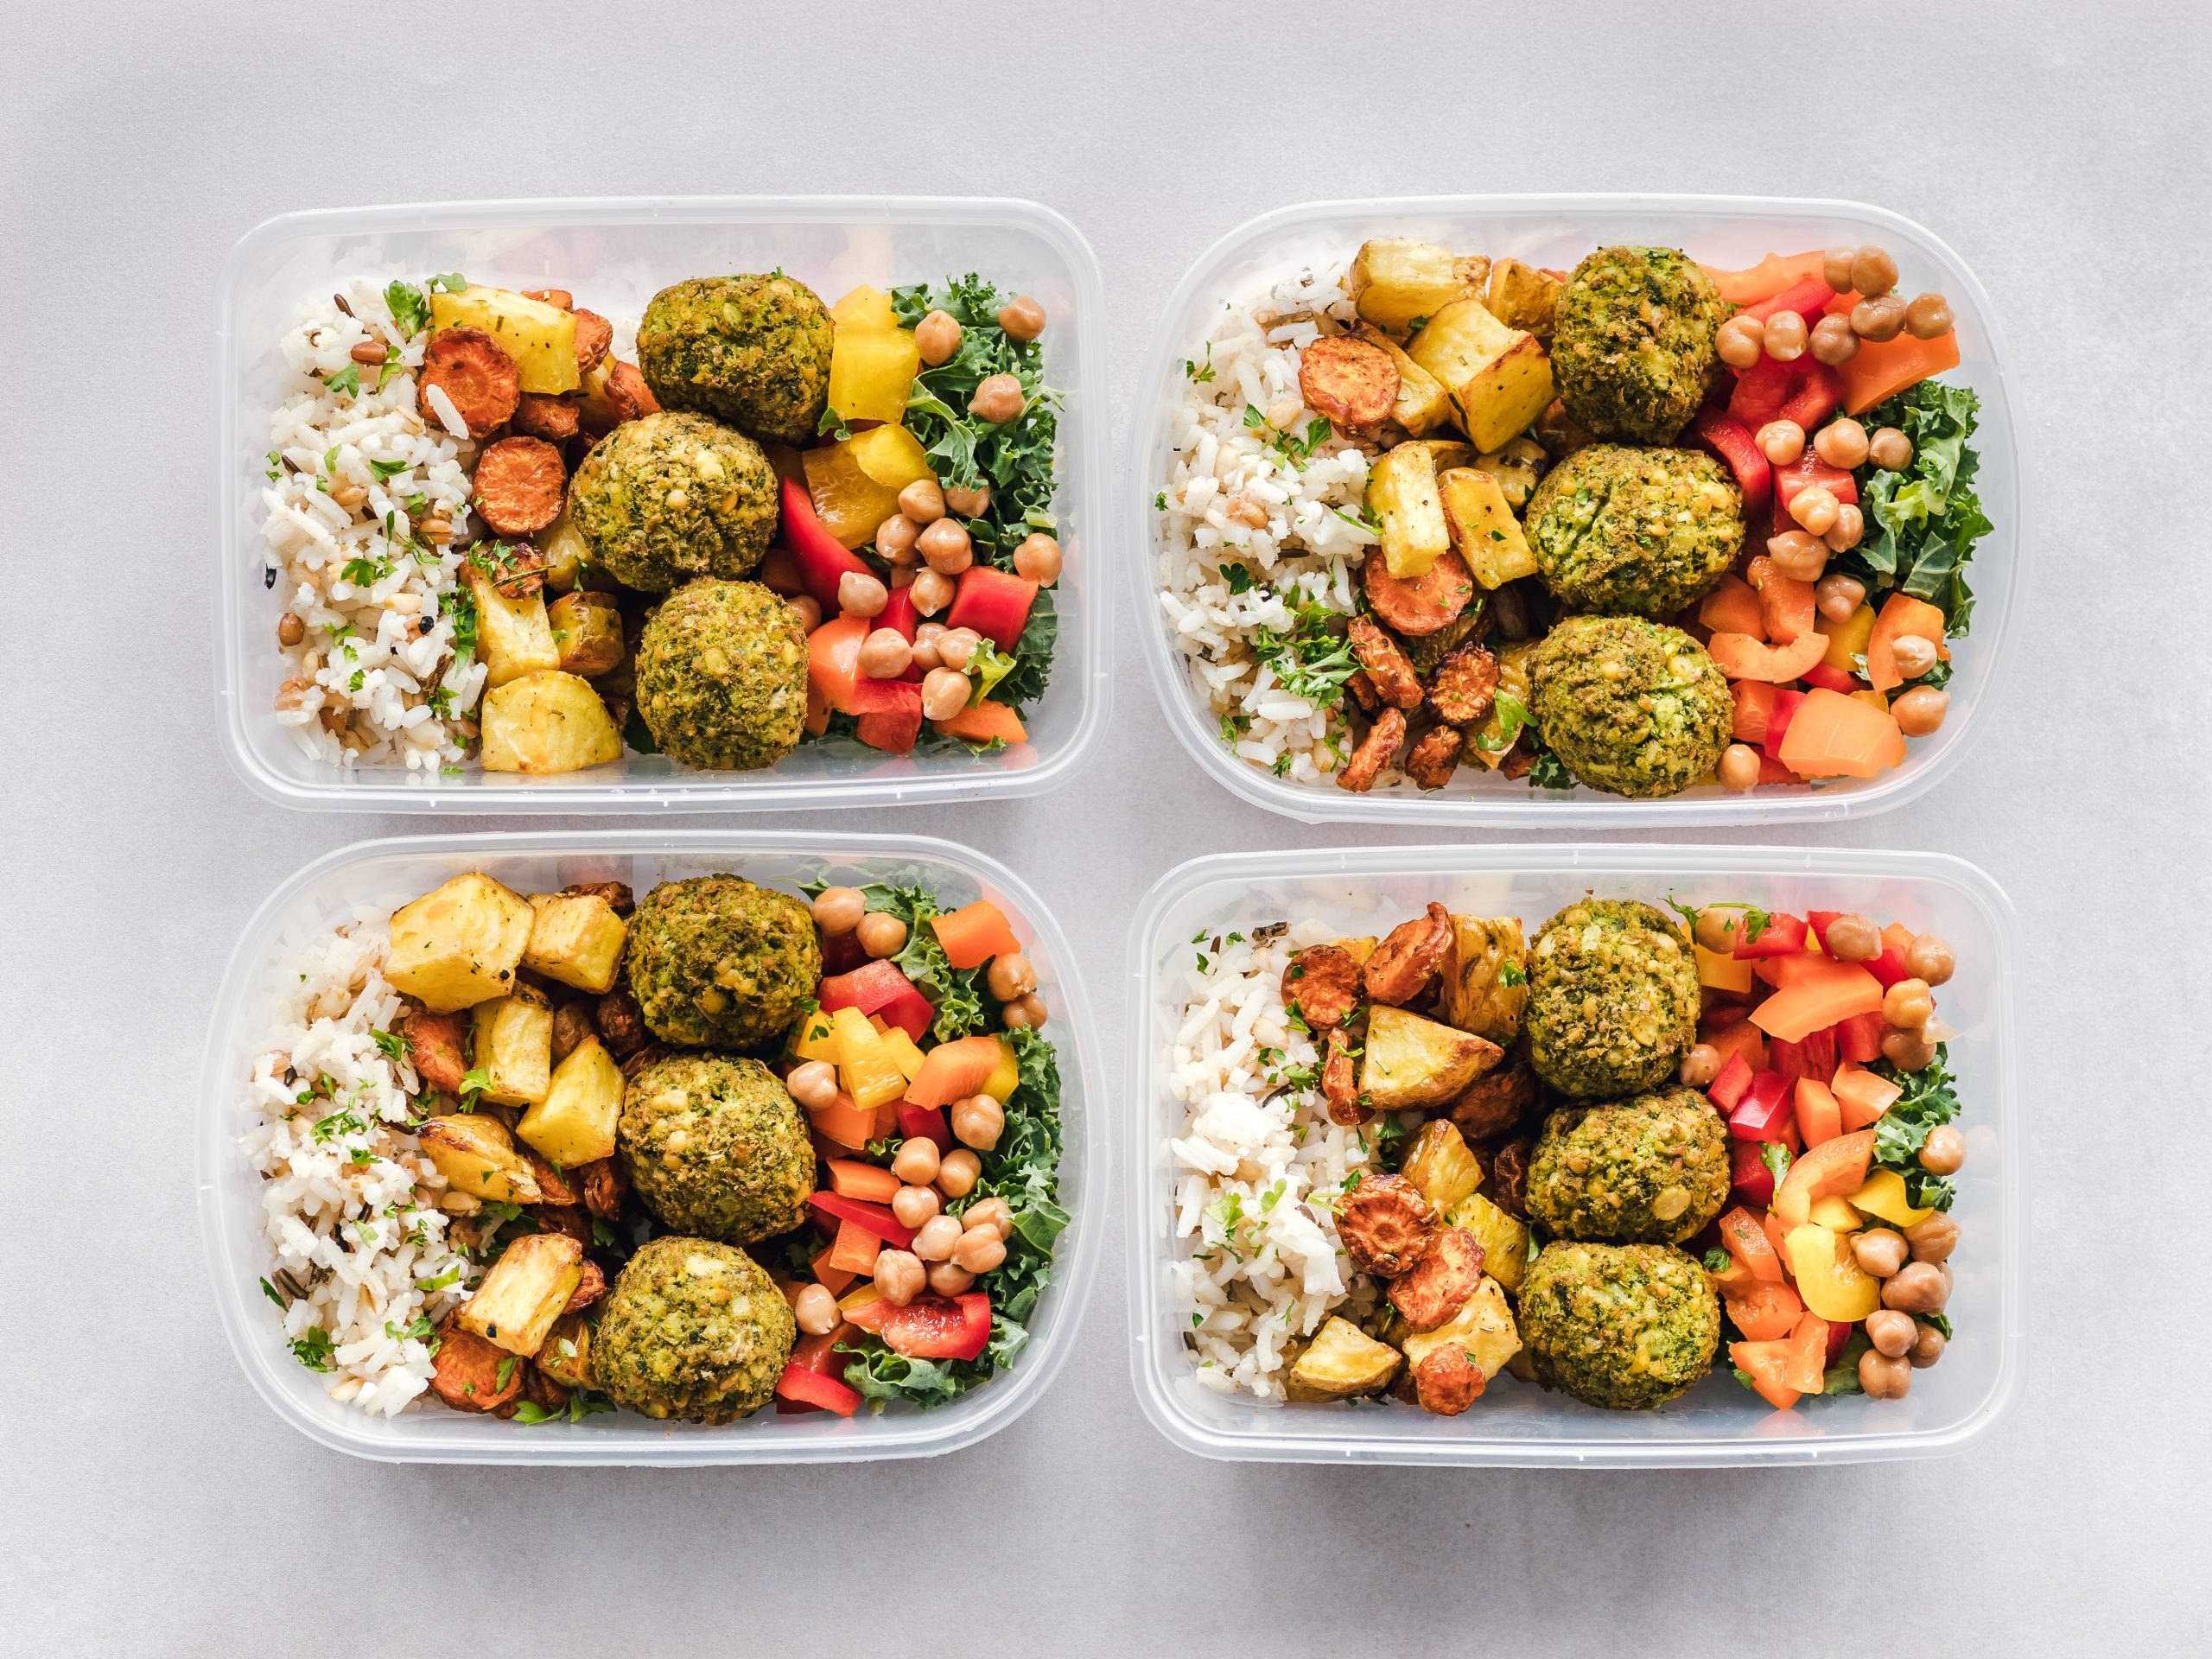 BistroMD Meal Plans Review